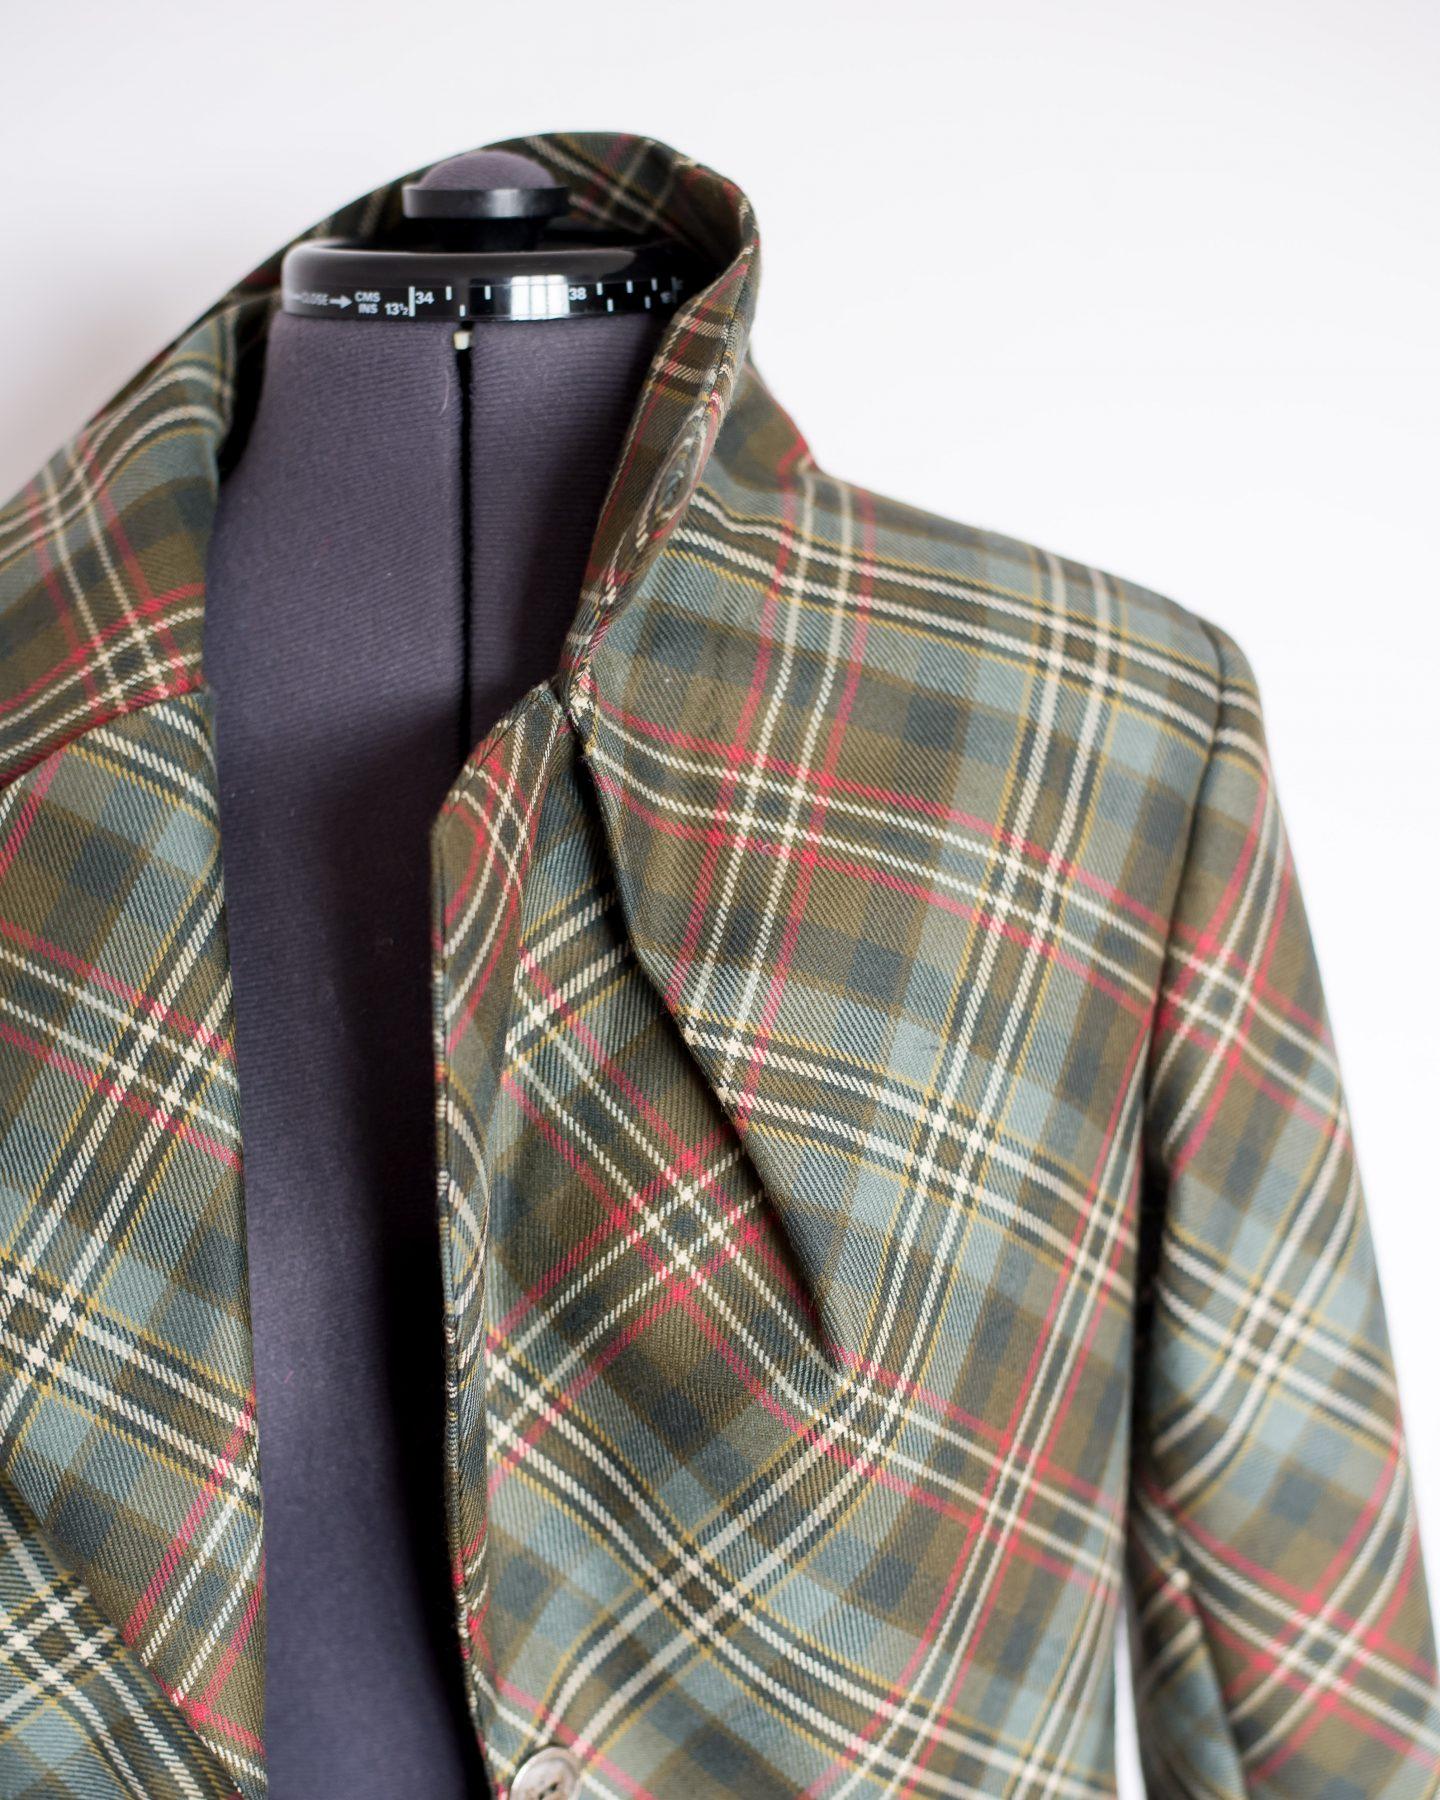 Tailored jacket part 2. Bust pleat detail.